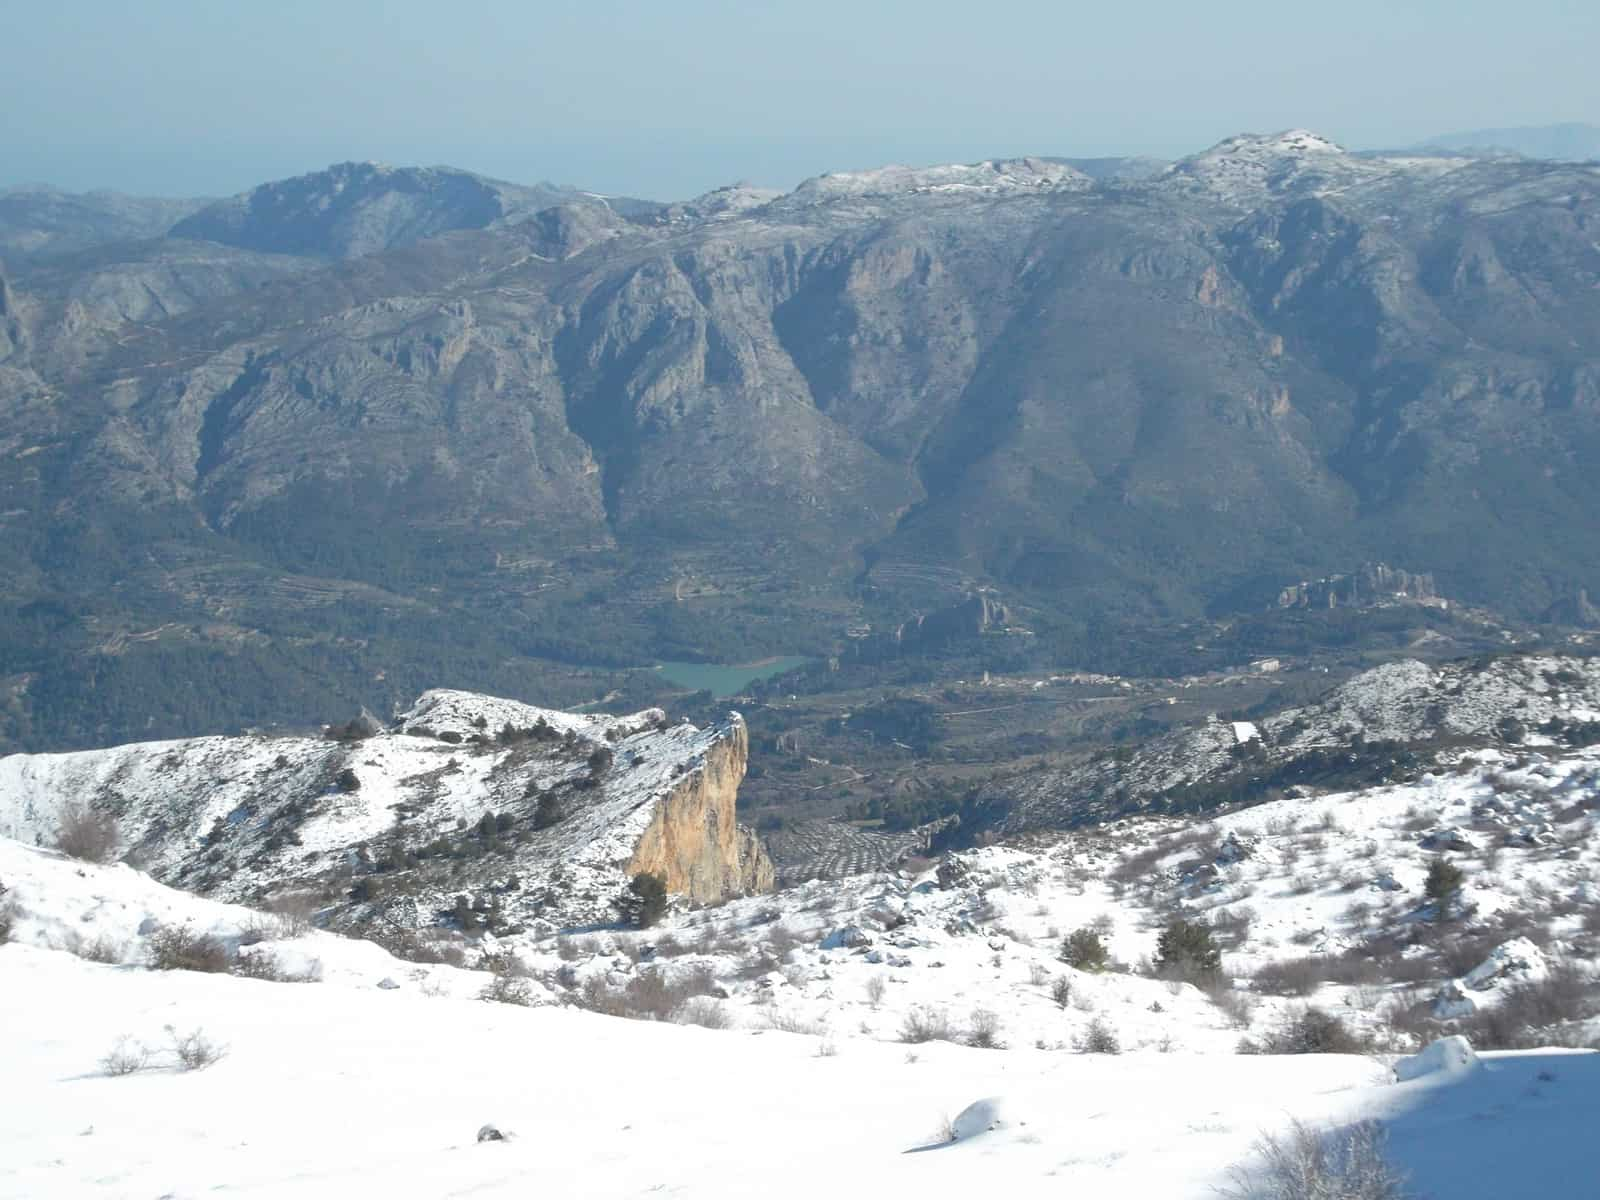 1405453563_Guadalest desde Aitana nevada